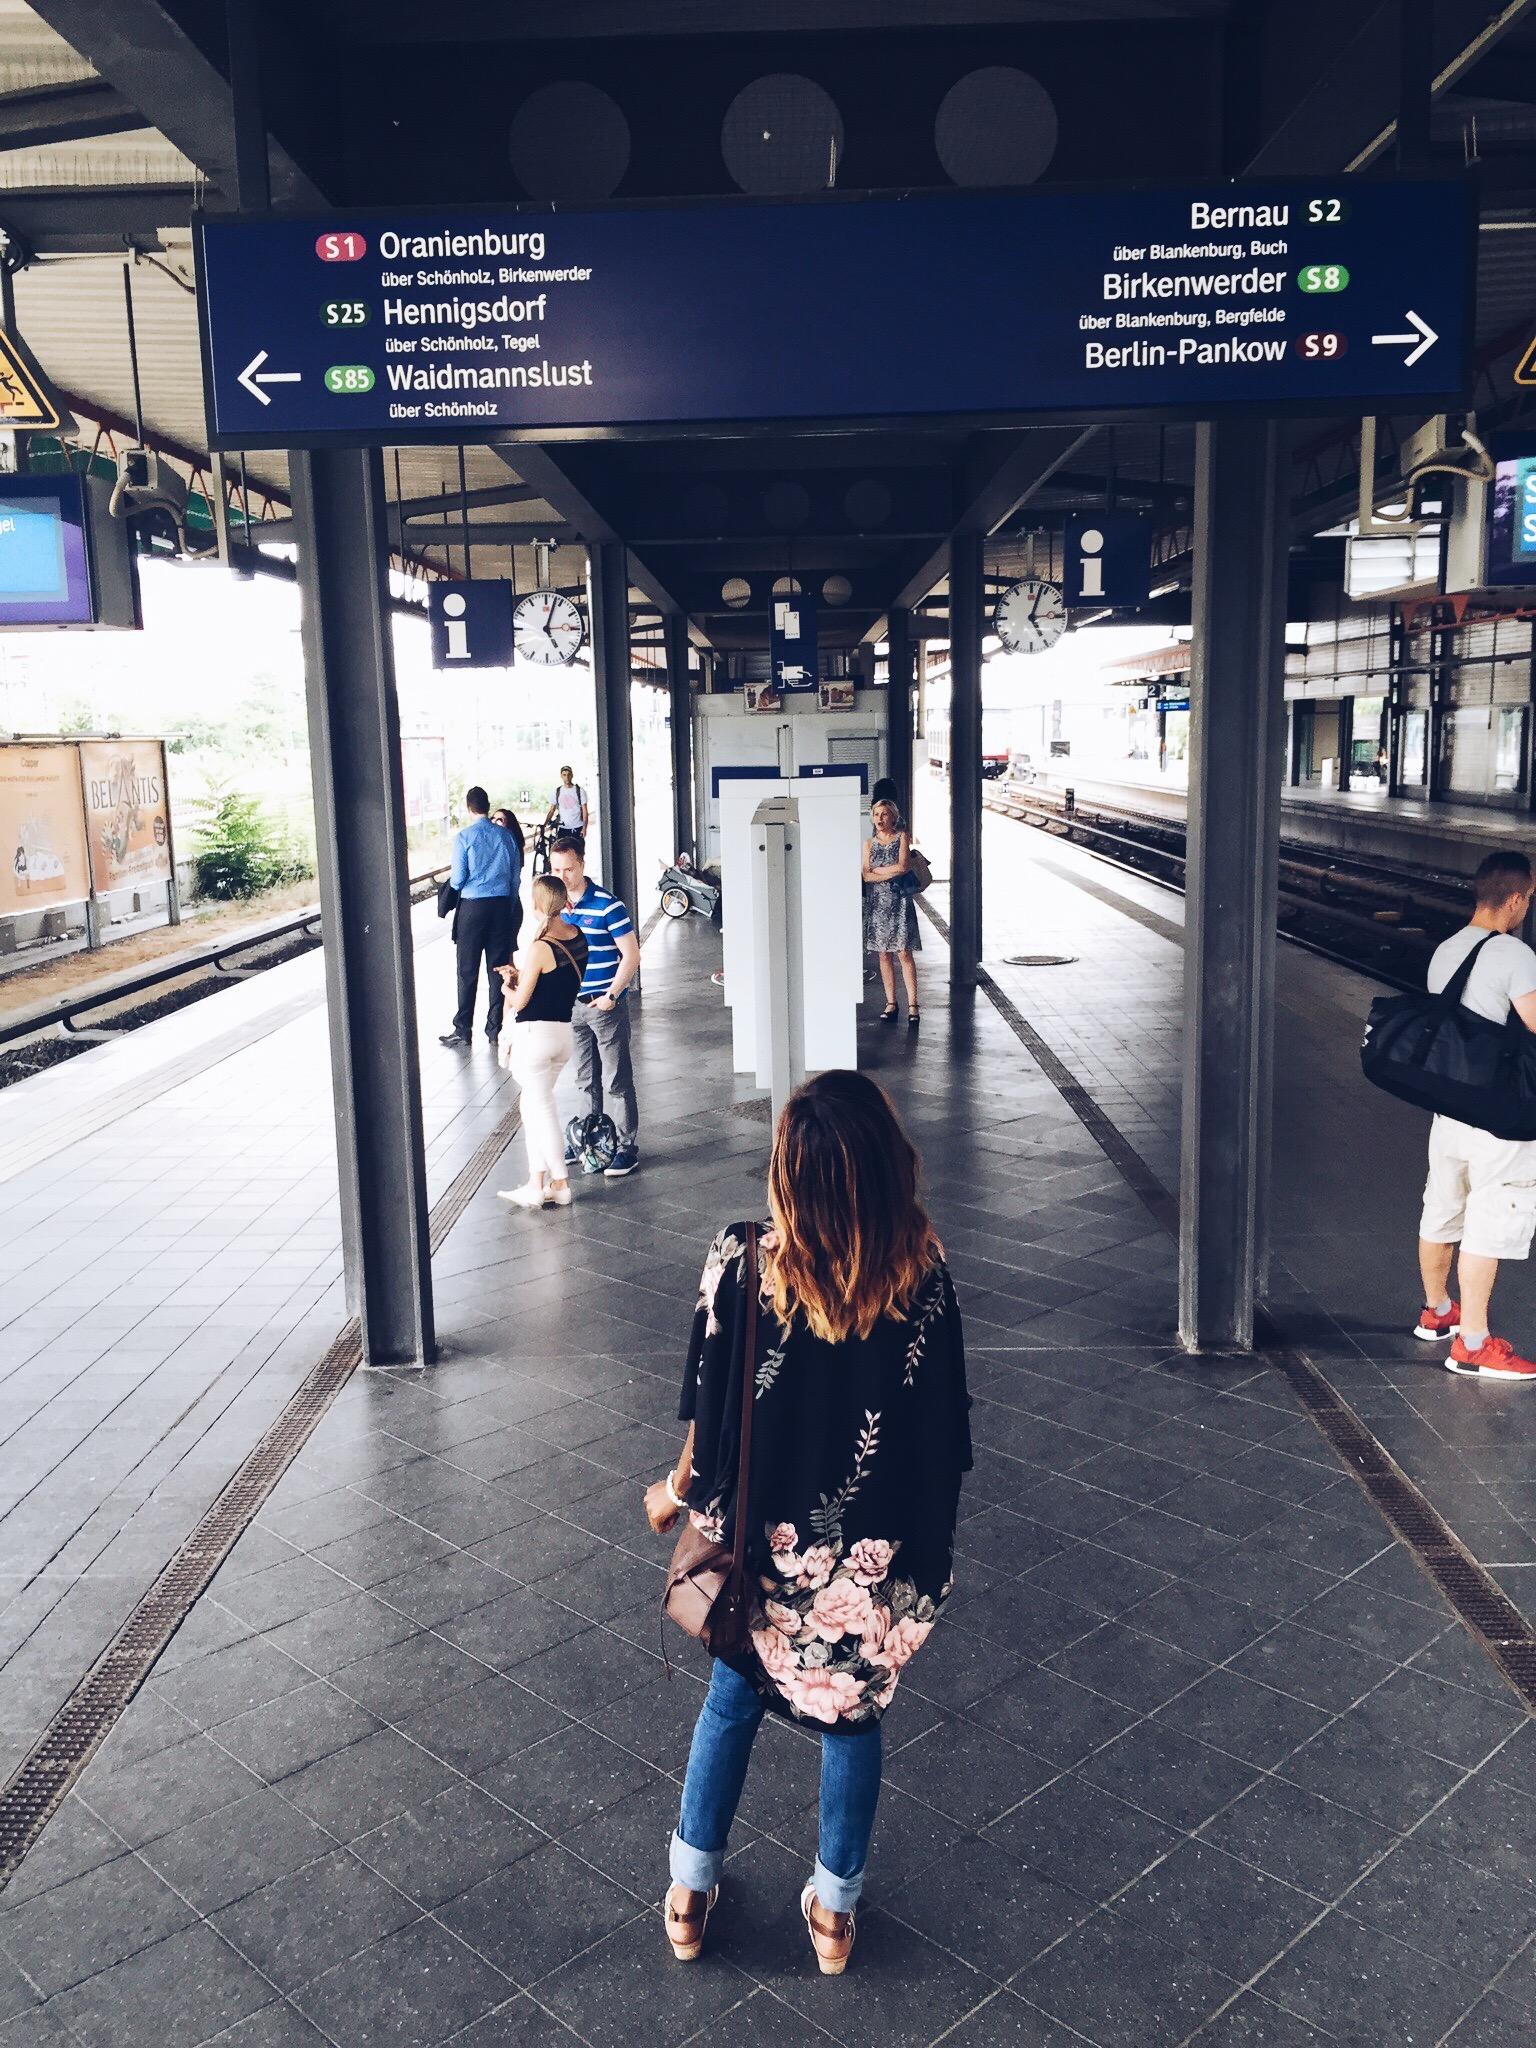 I love Berlin's transit system. It's so easy to navigate!